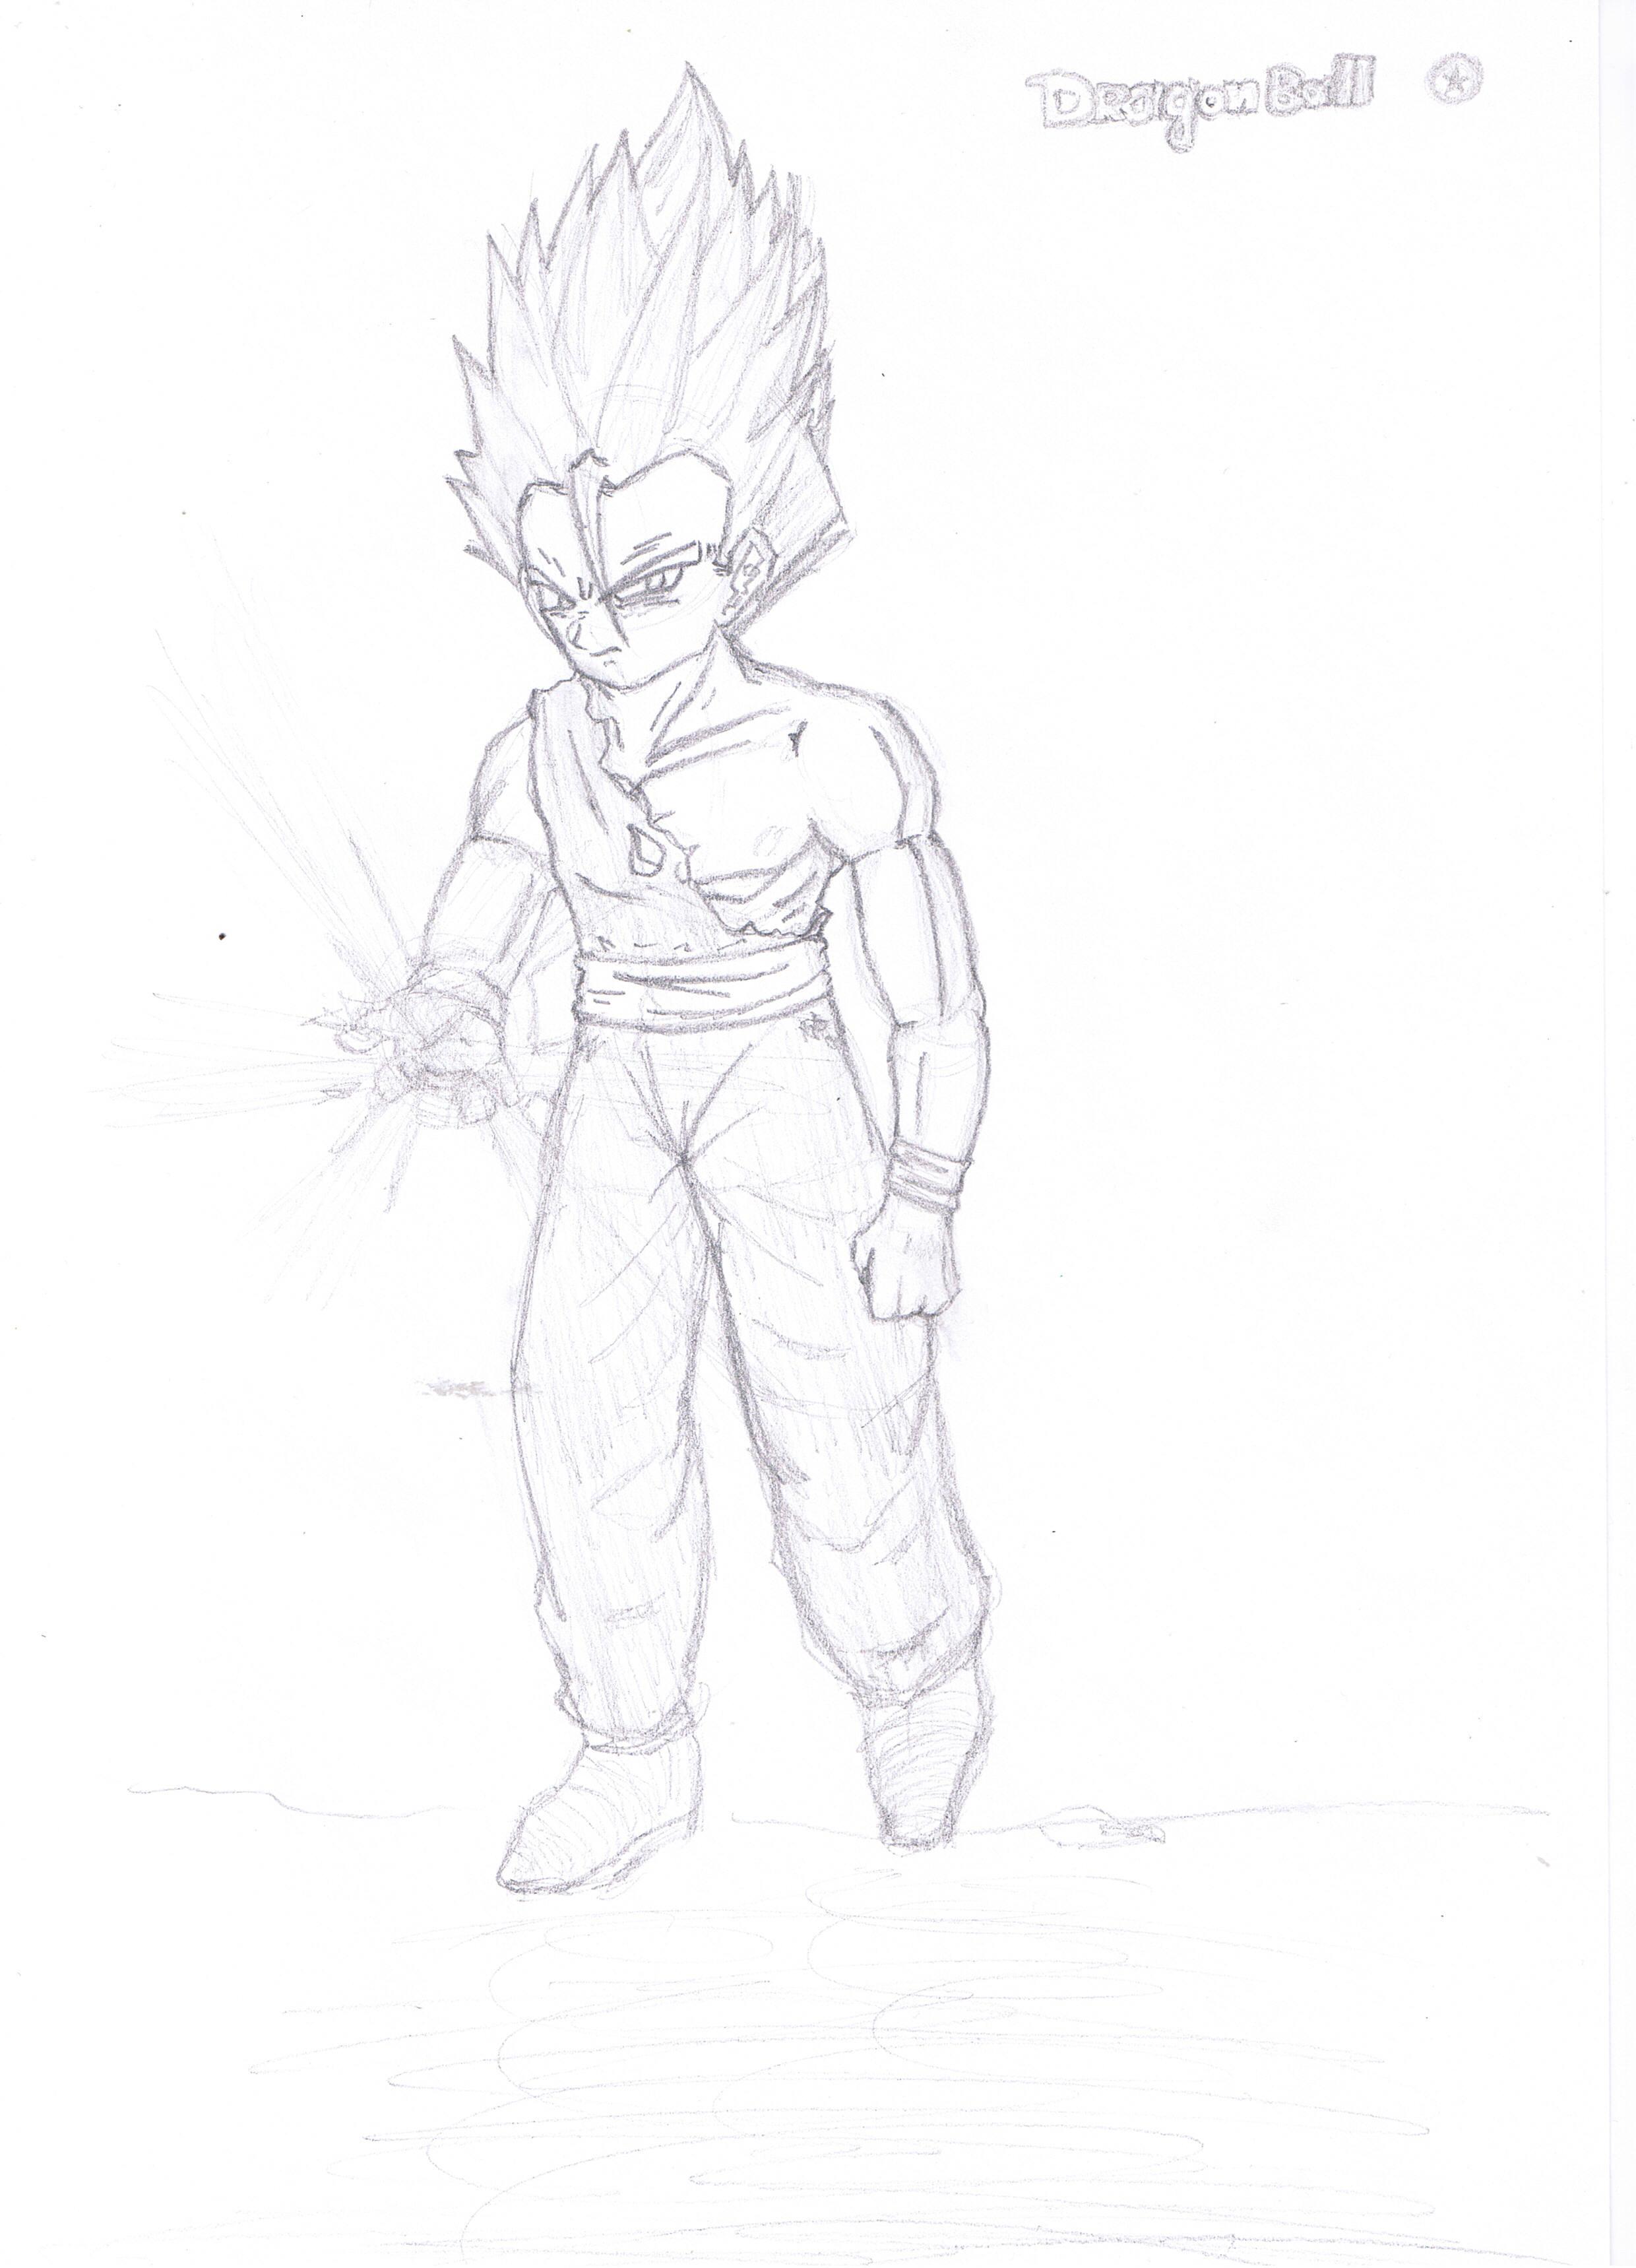 Aska... ¿Artwork? xD - Página 2 Son_gohan_ssj2___sketch_by_quiroh-d60n9il